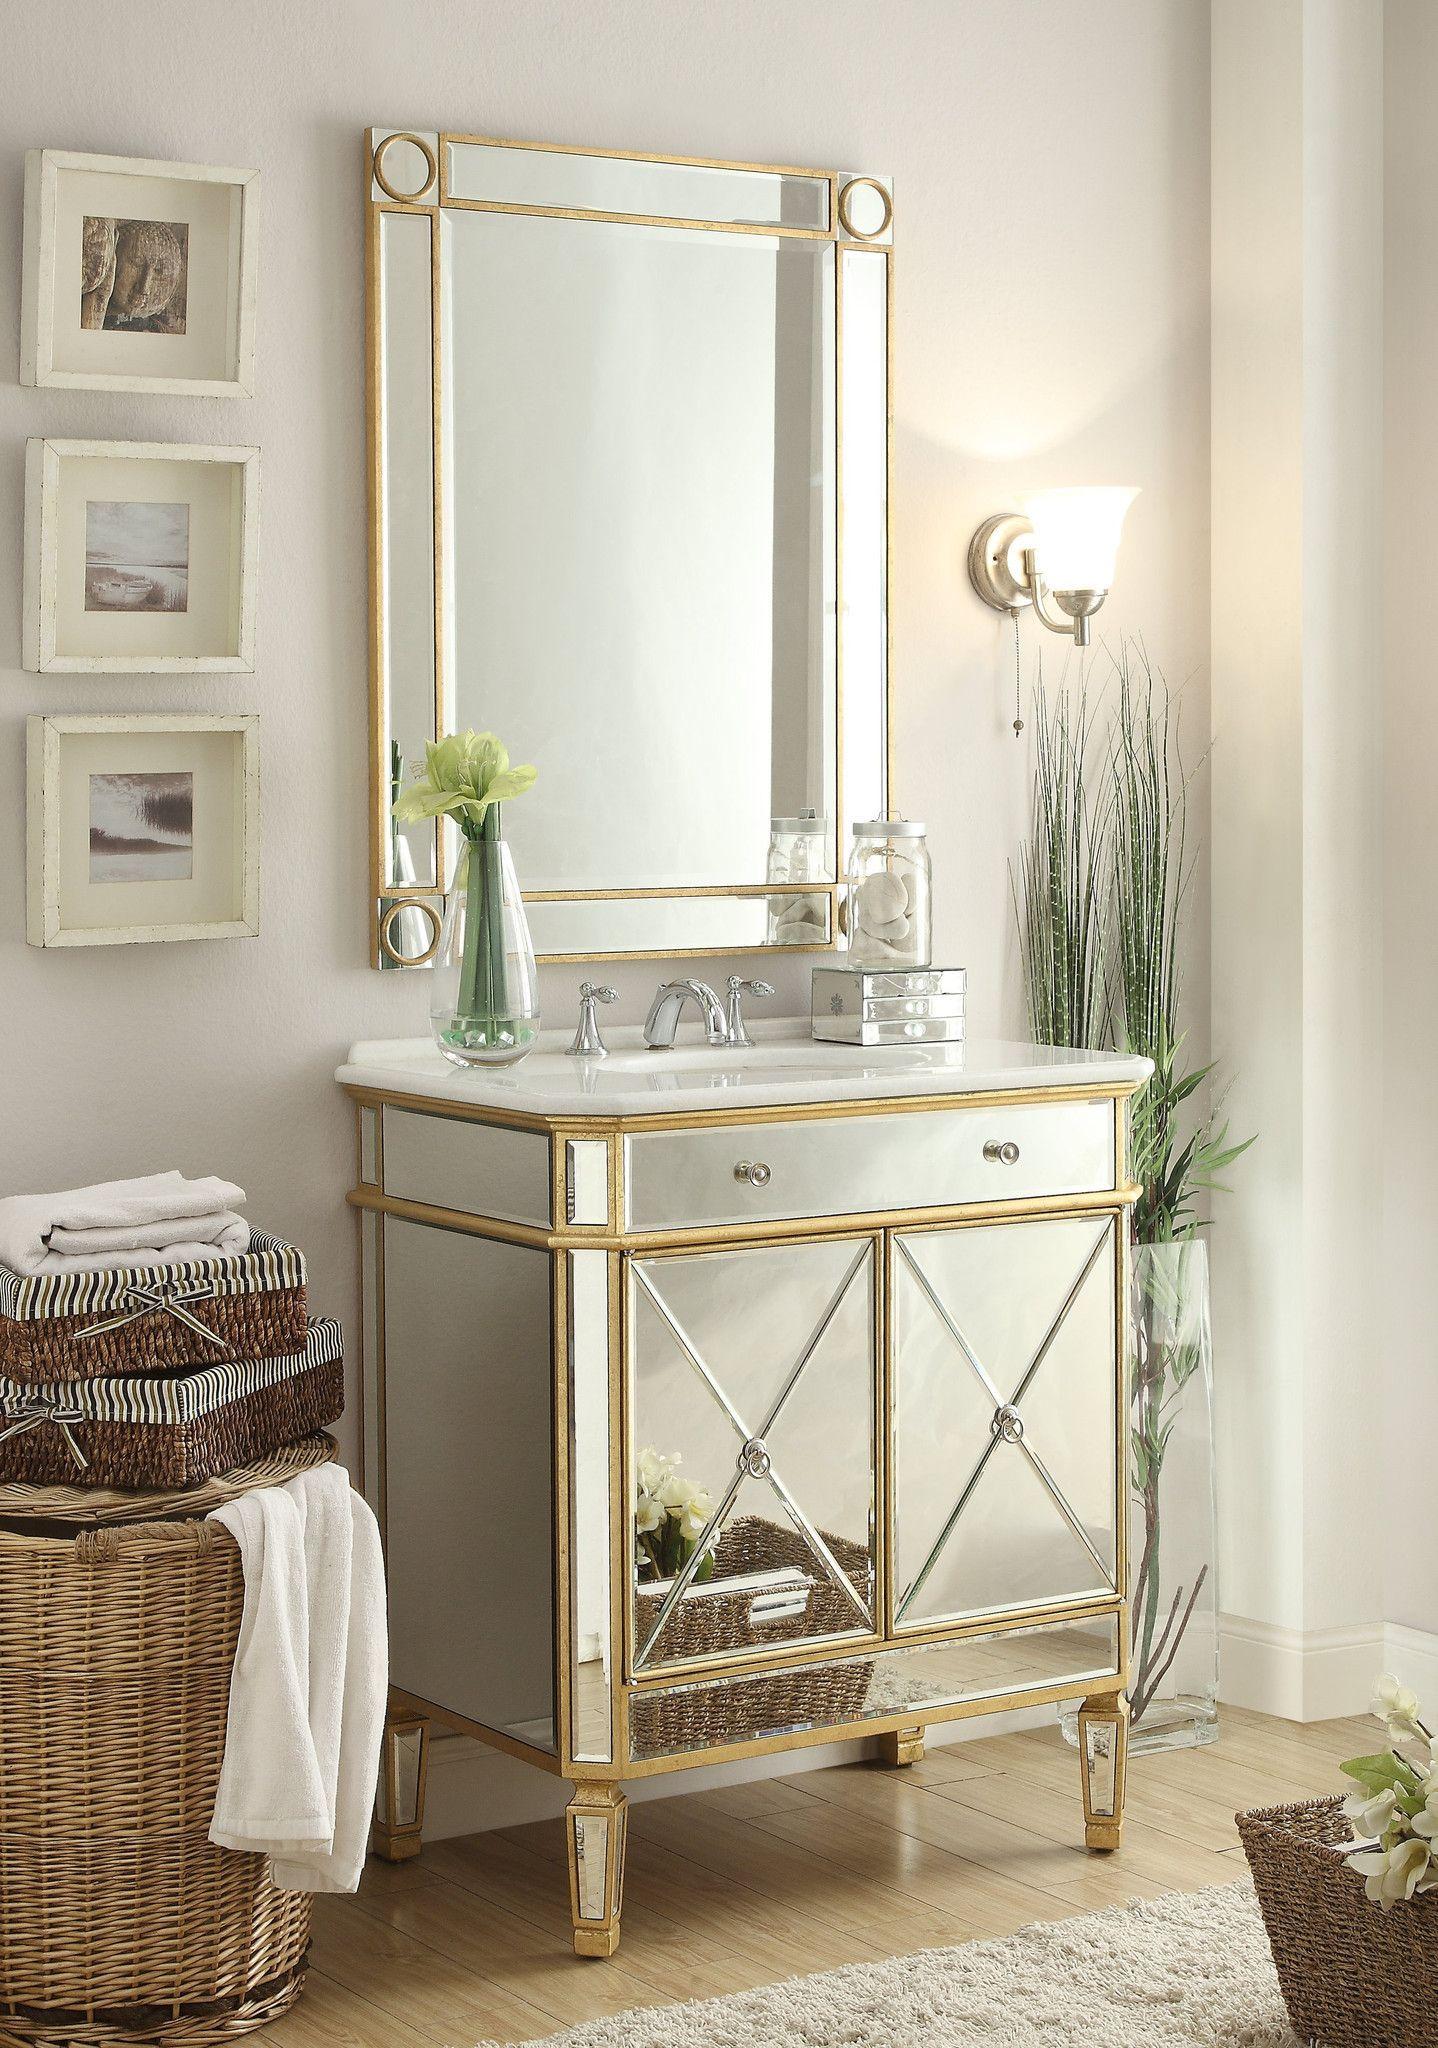 bathroom mirror reflection. 32\ Bathroom Mirror Reflection D